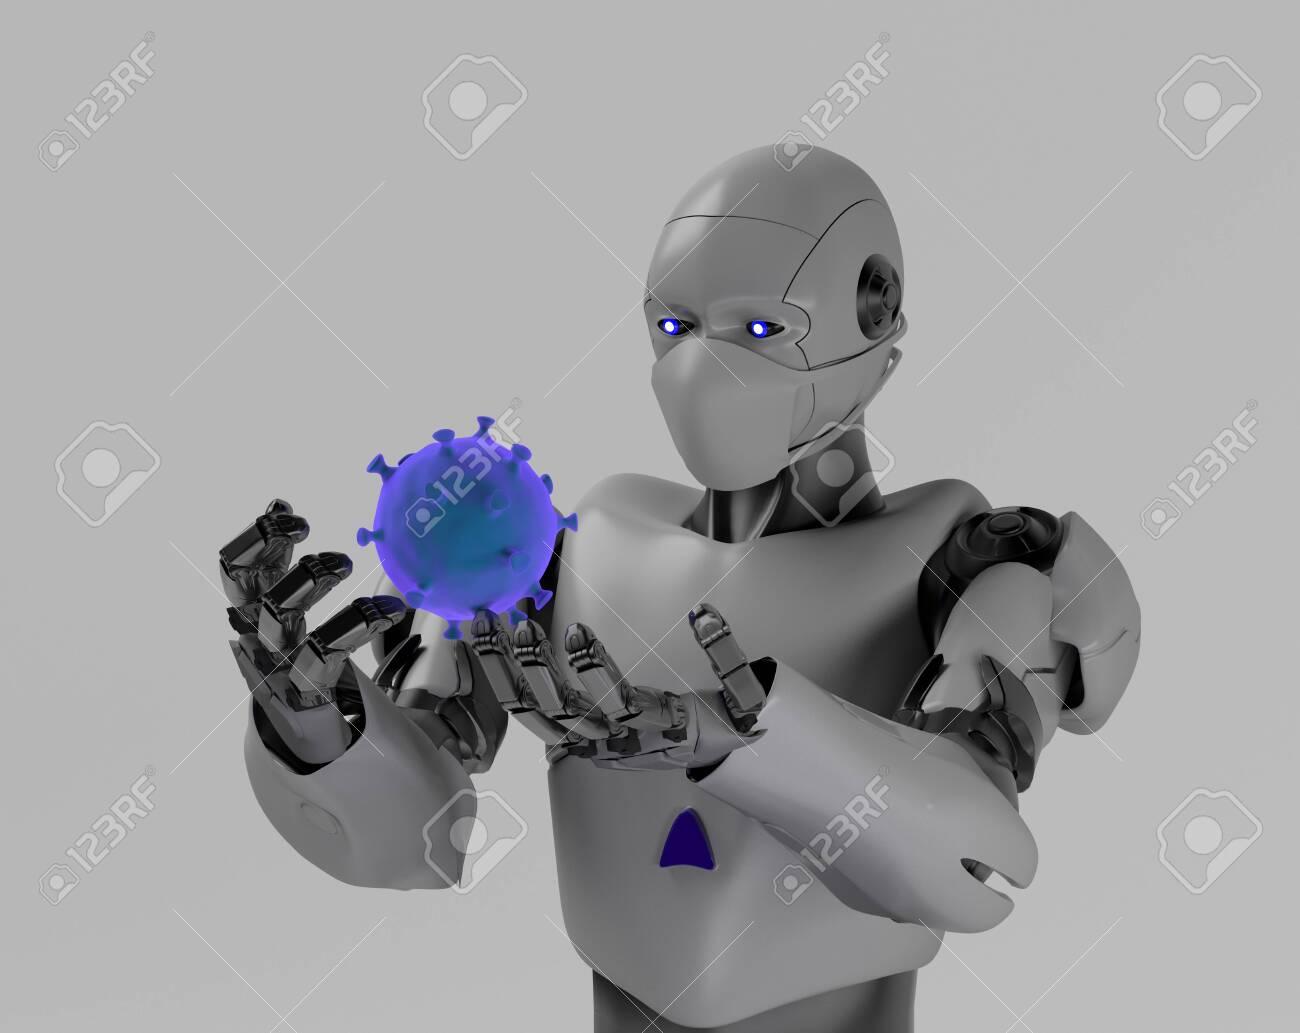 The robot studies a coronavirus with gauze mask medical,nano robot with bacterium,3d render. - 143238480